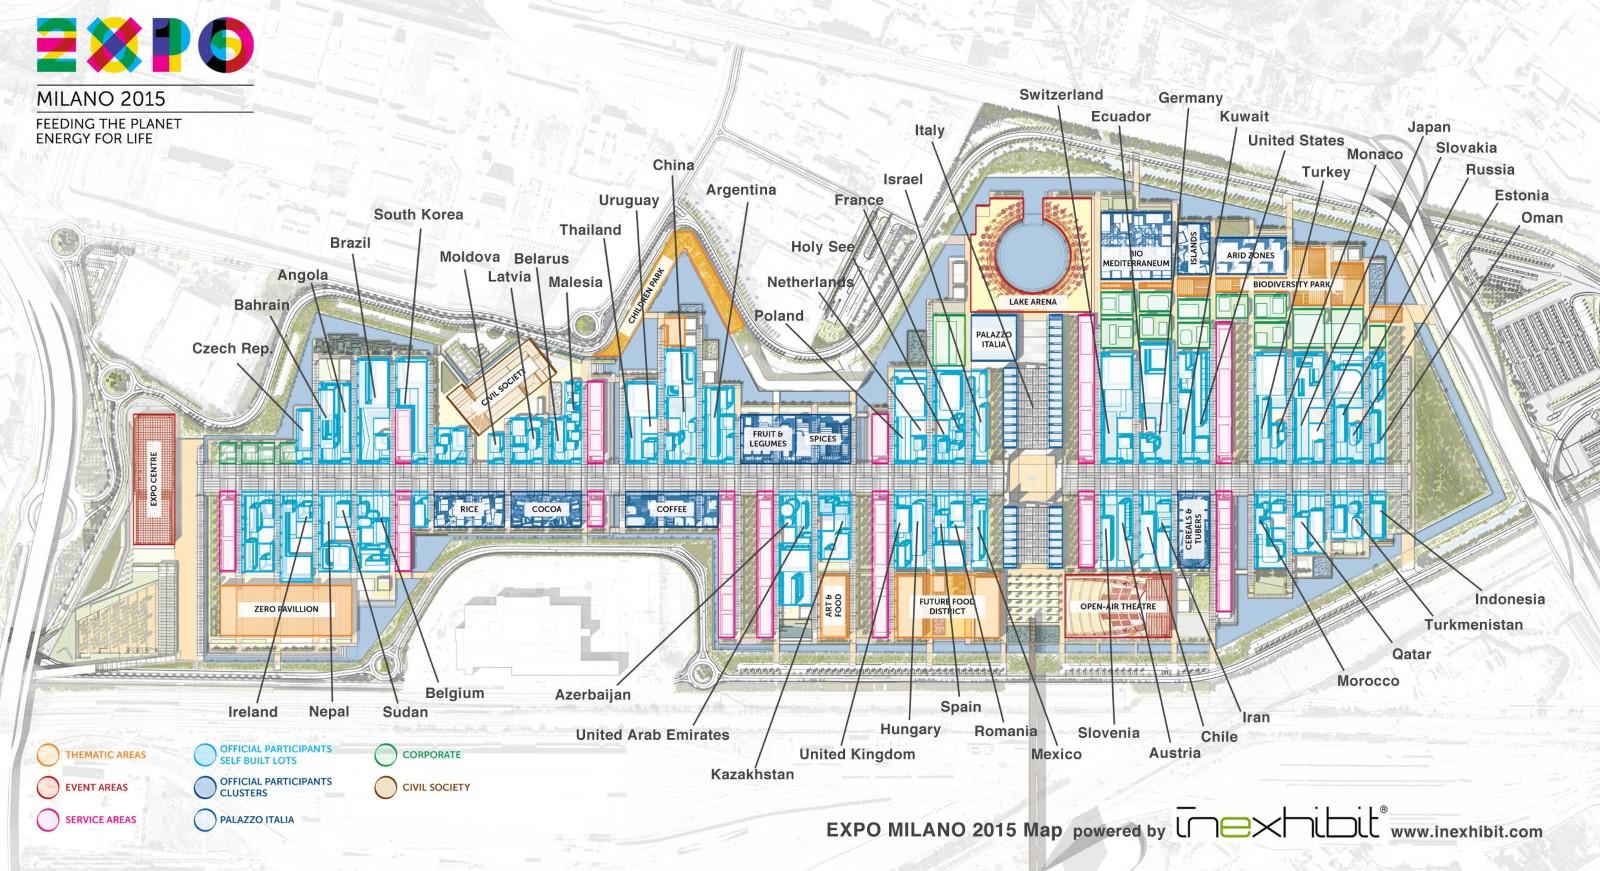 expo-milan-2015-site-map-inexhibit-mid.jpg